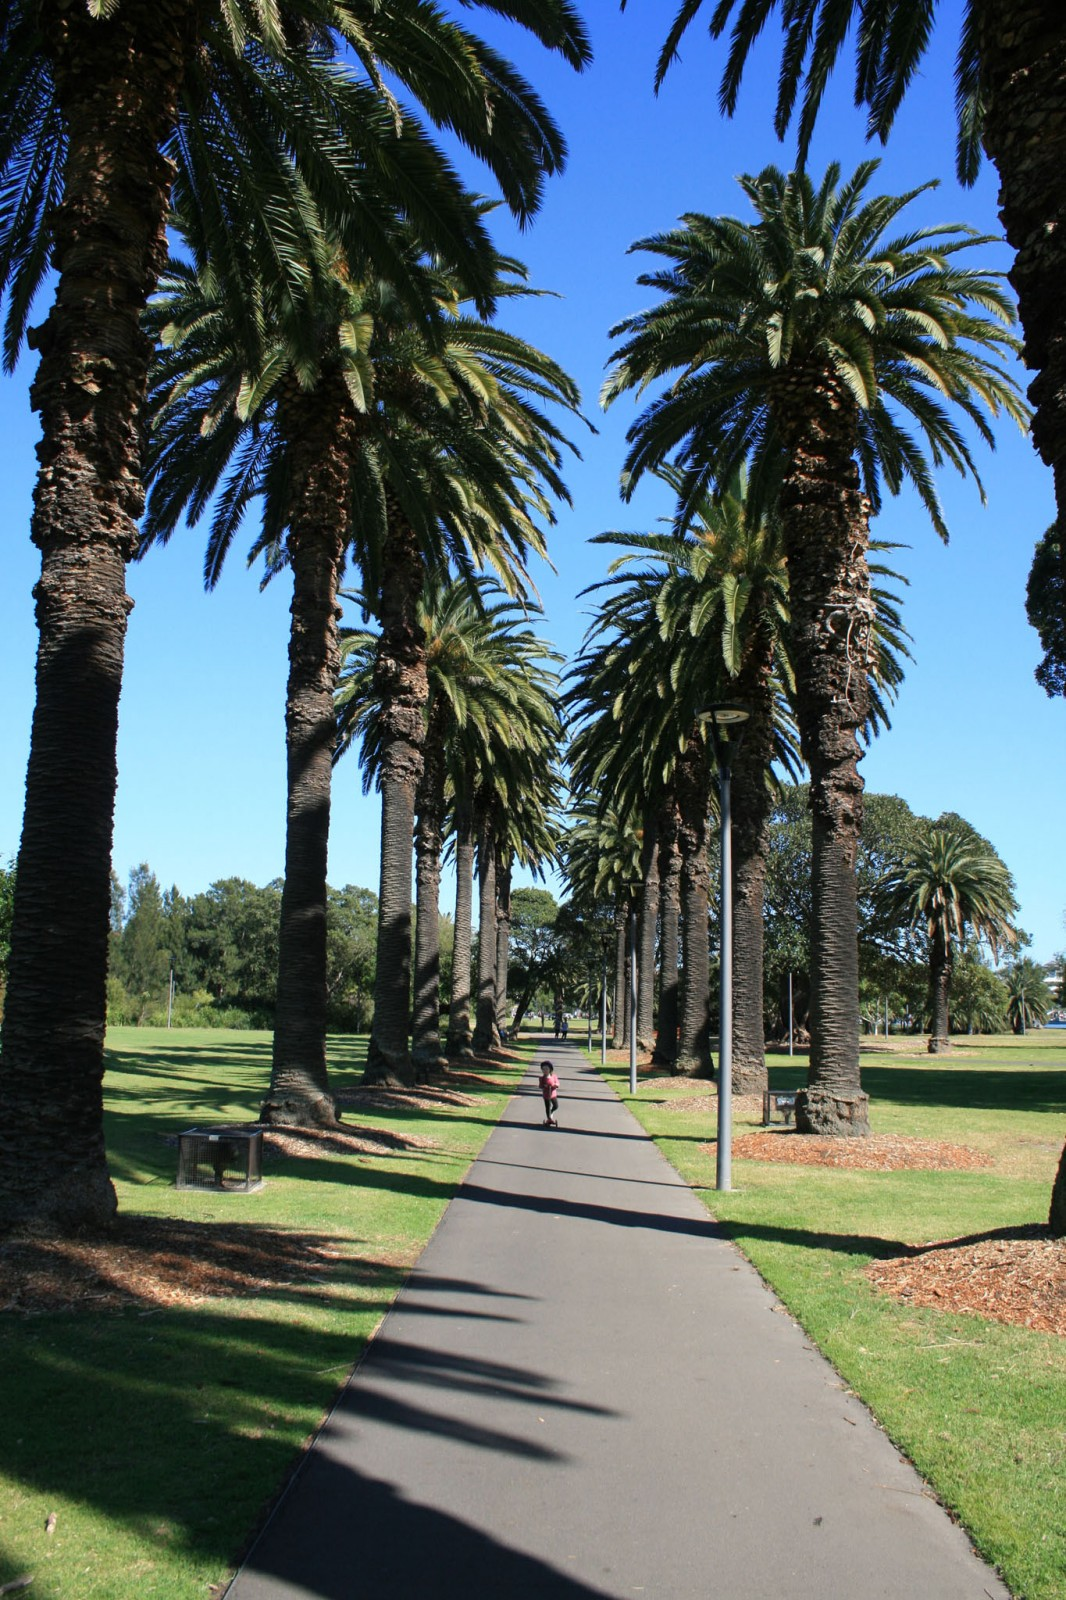 Canary Island Date Palms in Jubilee Park